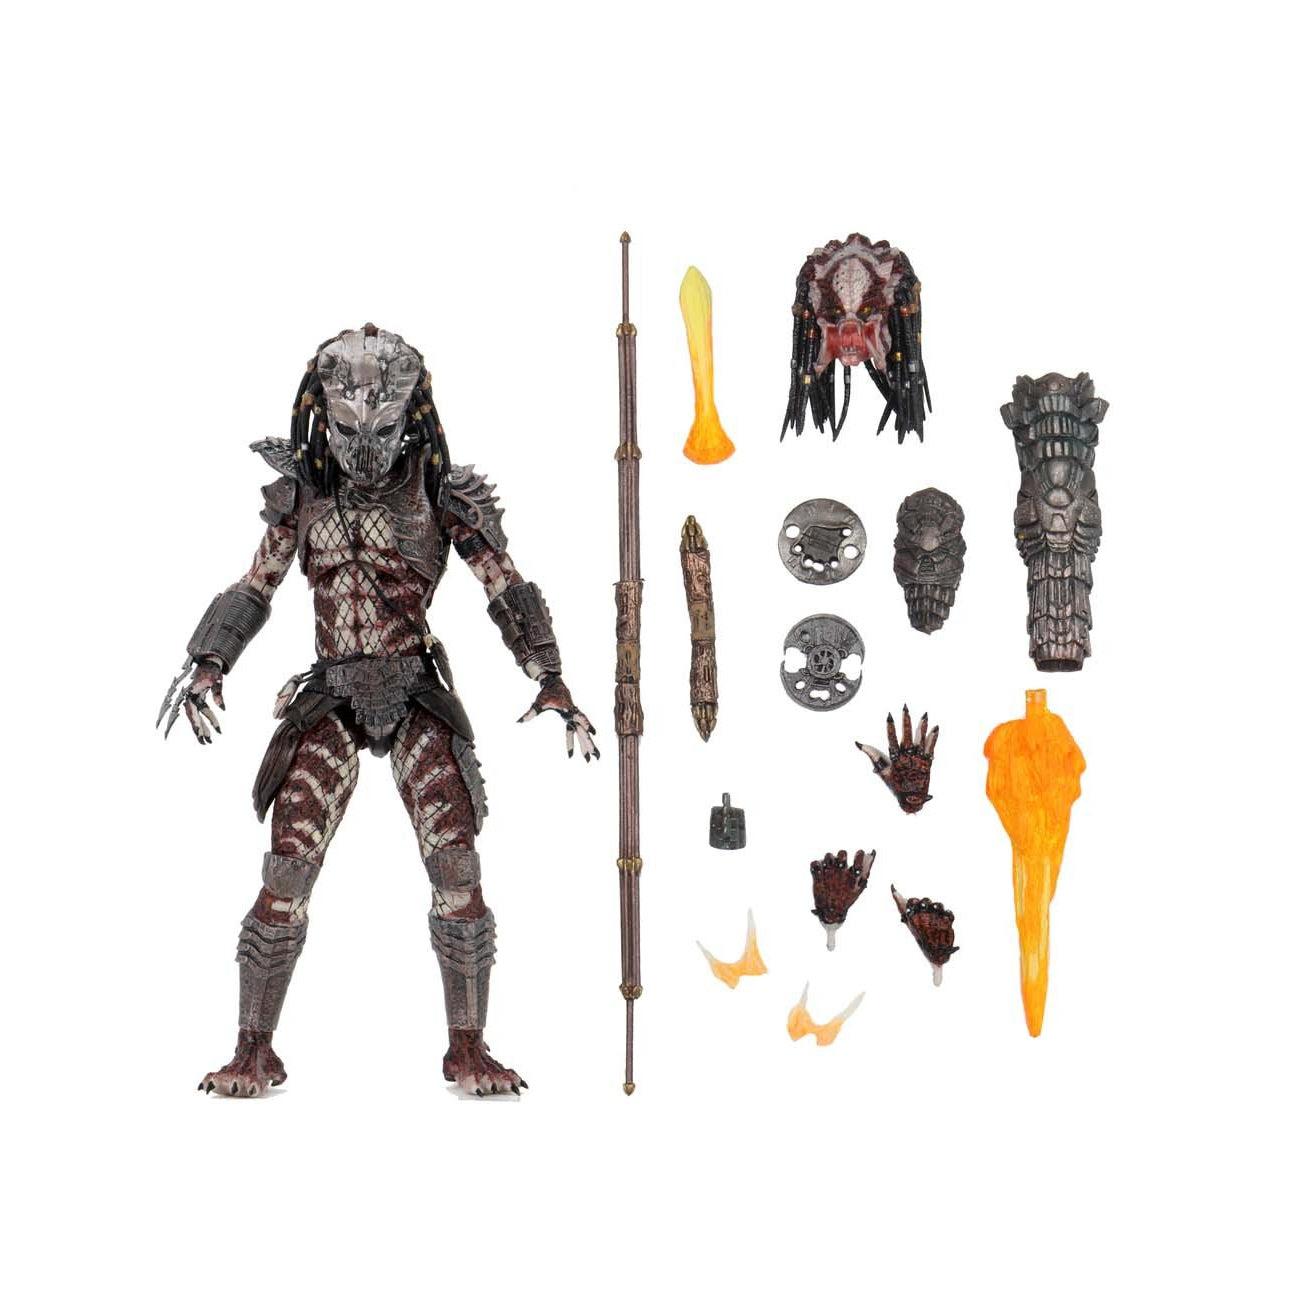 Image of Predator 2 – Ultimate Guardian Predator 7″ Scale Figure - OCTOBER 2020